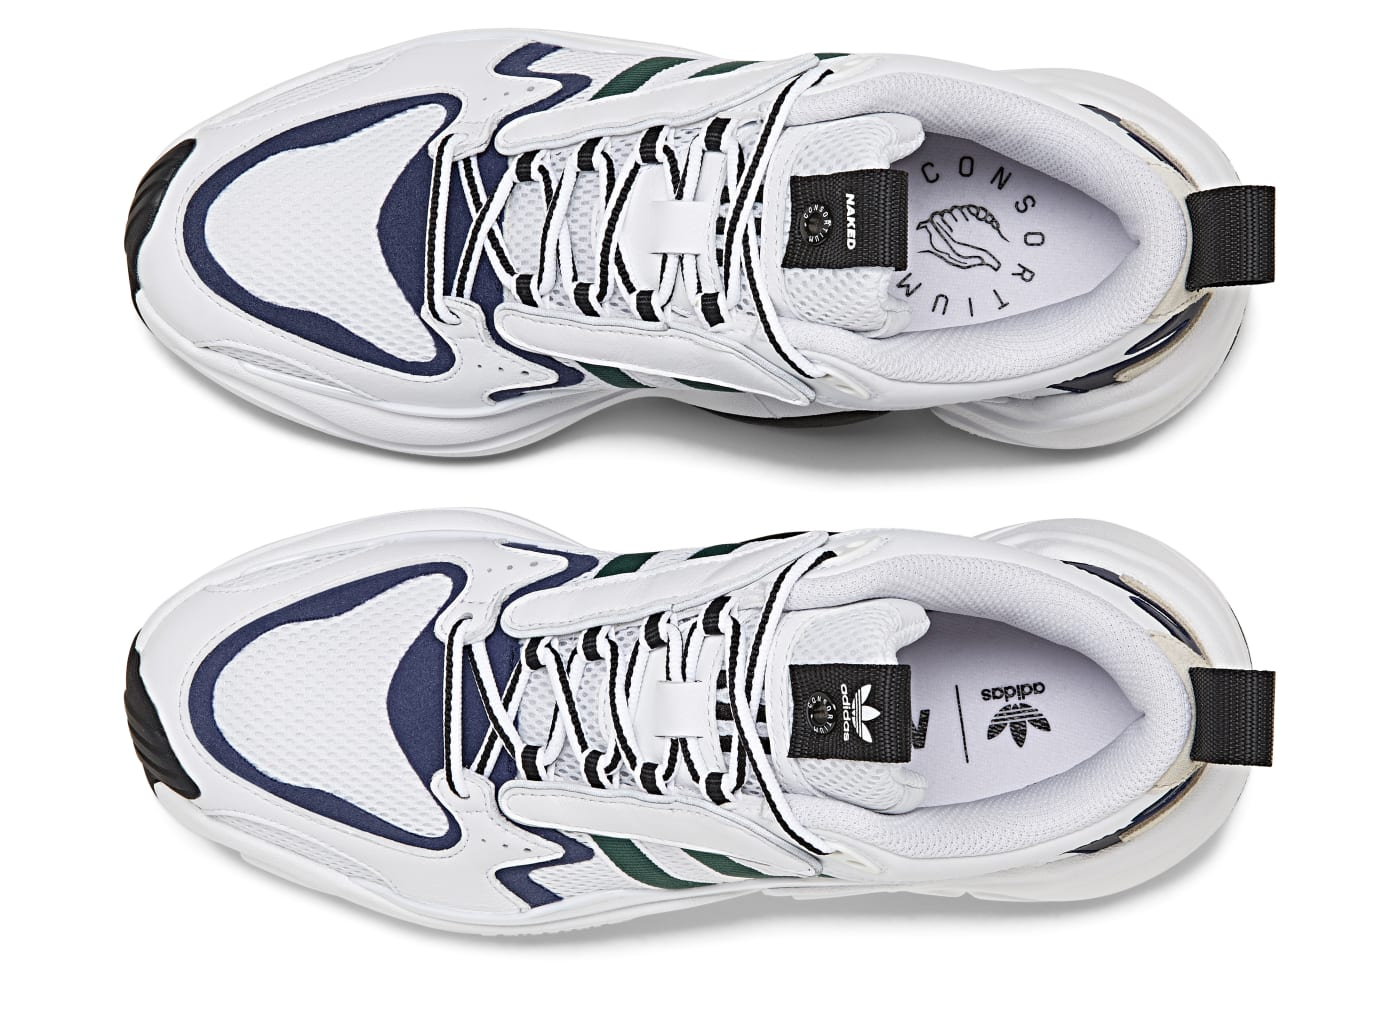 Adidas Consortium Communitas Naked Magmur Runner G26279 (Top)